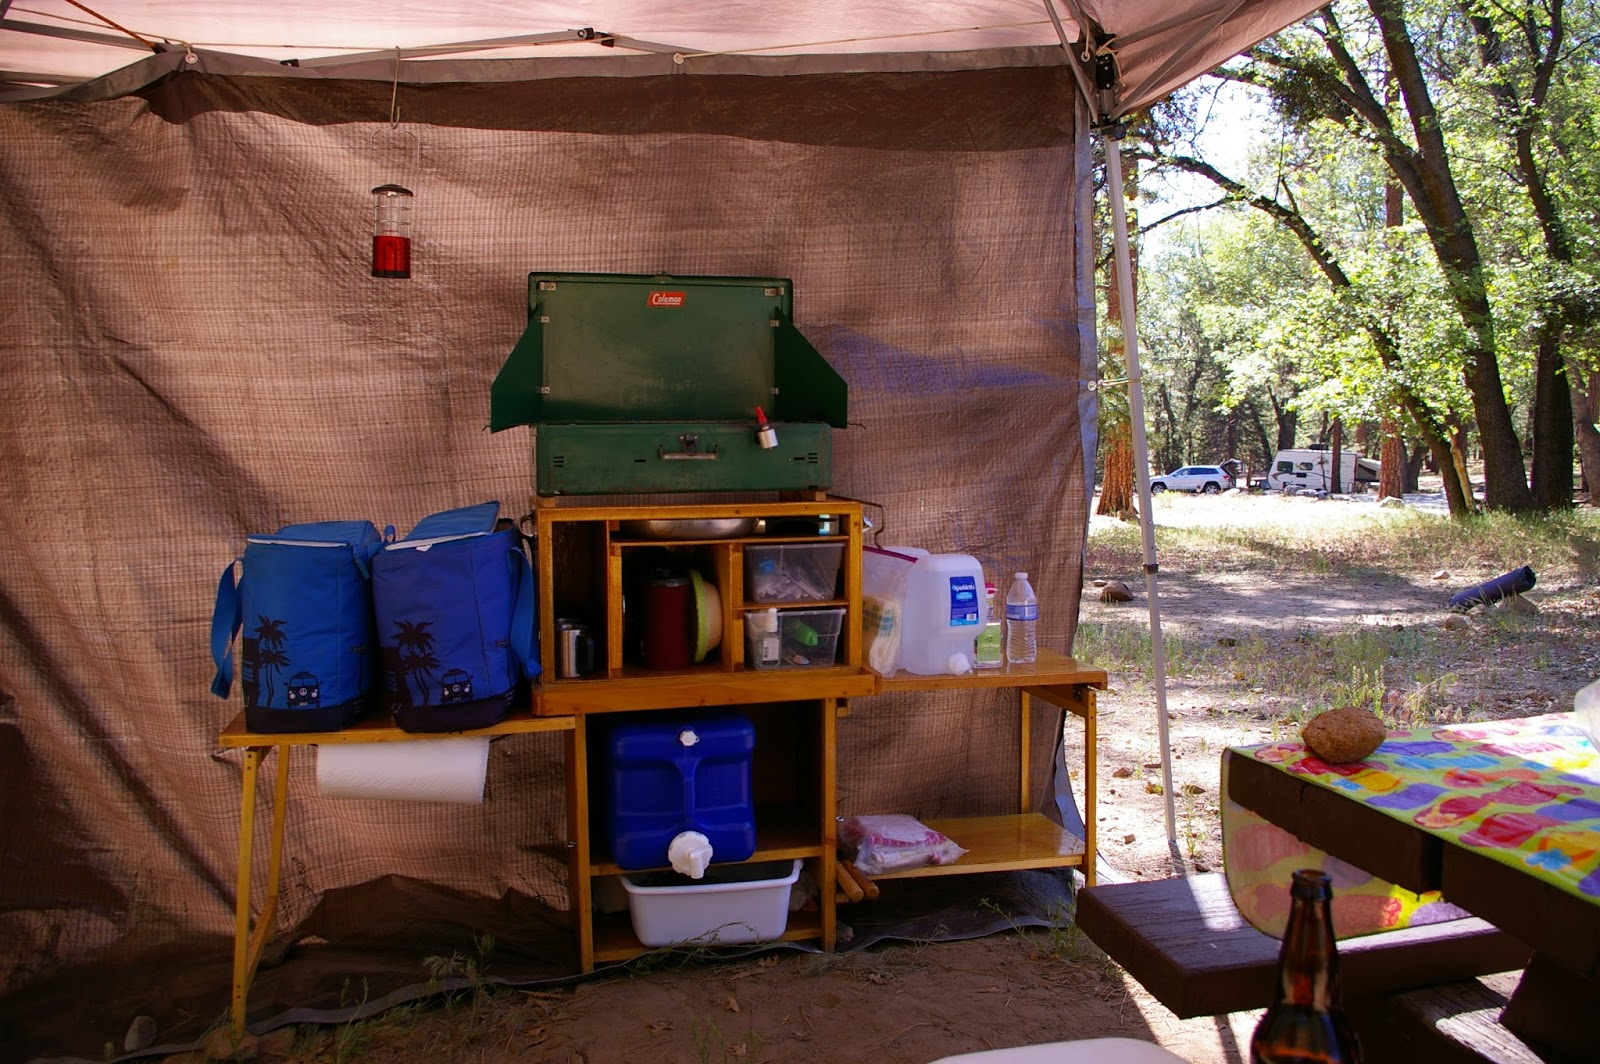 Outdoorküche Camping Ground : Mobile outdoor küche camping outdoor küche camping croing stk